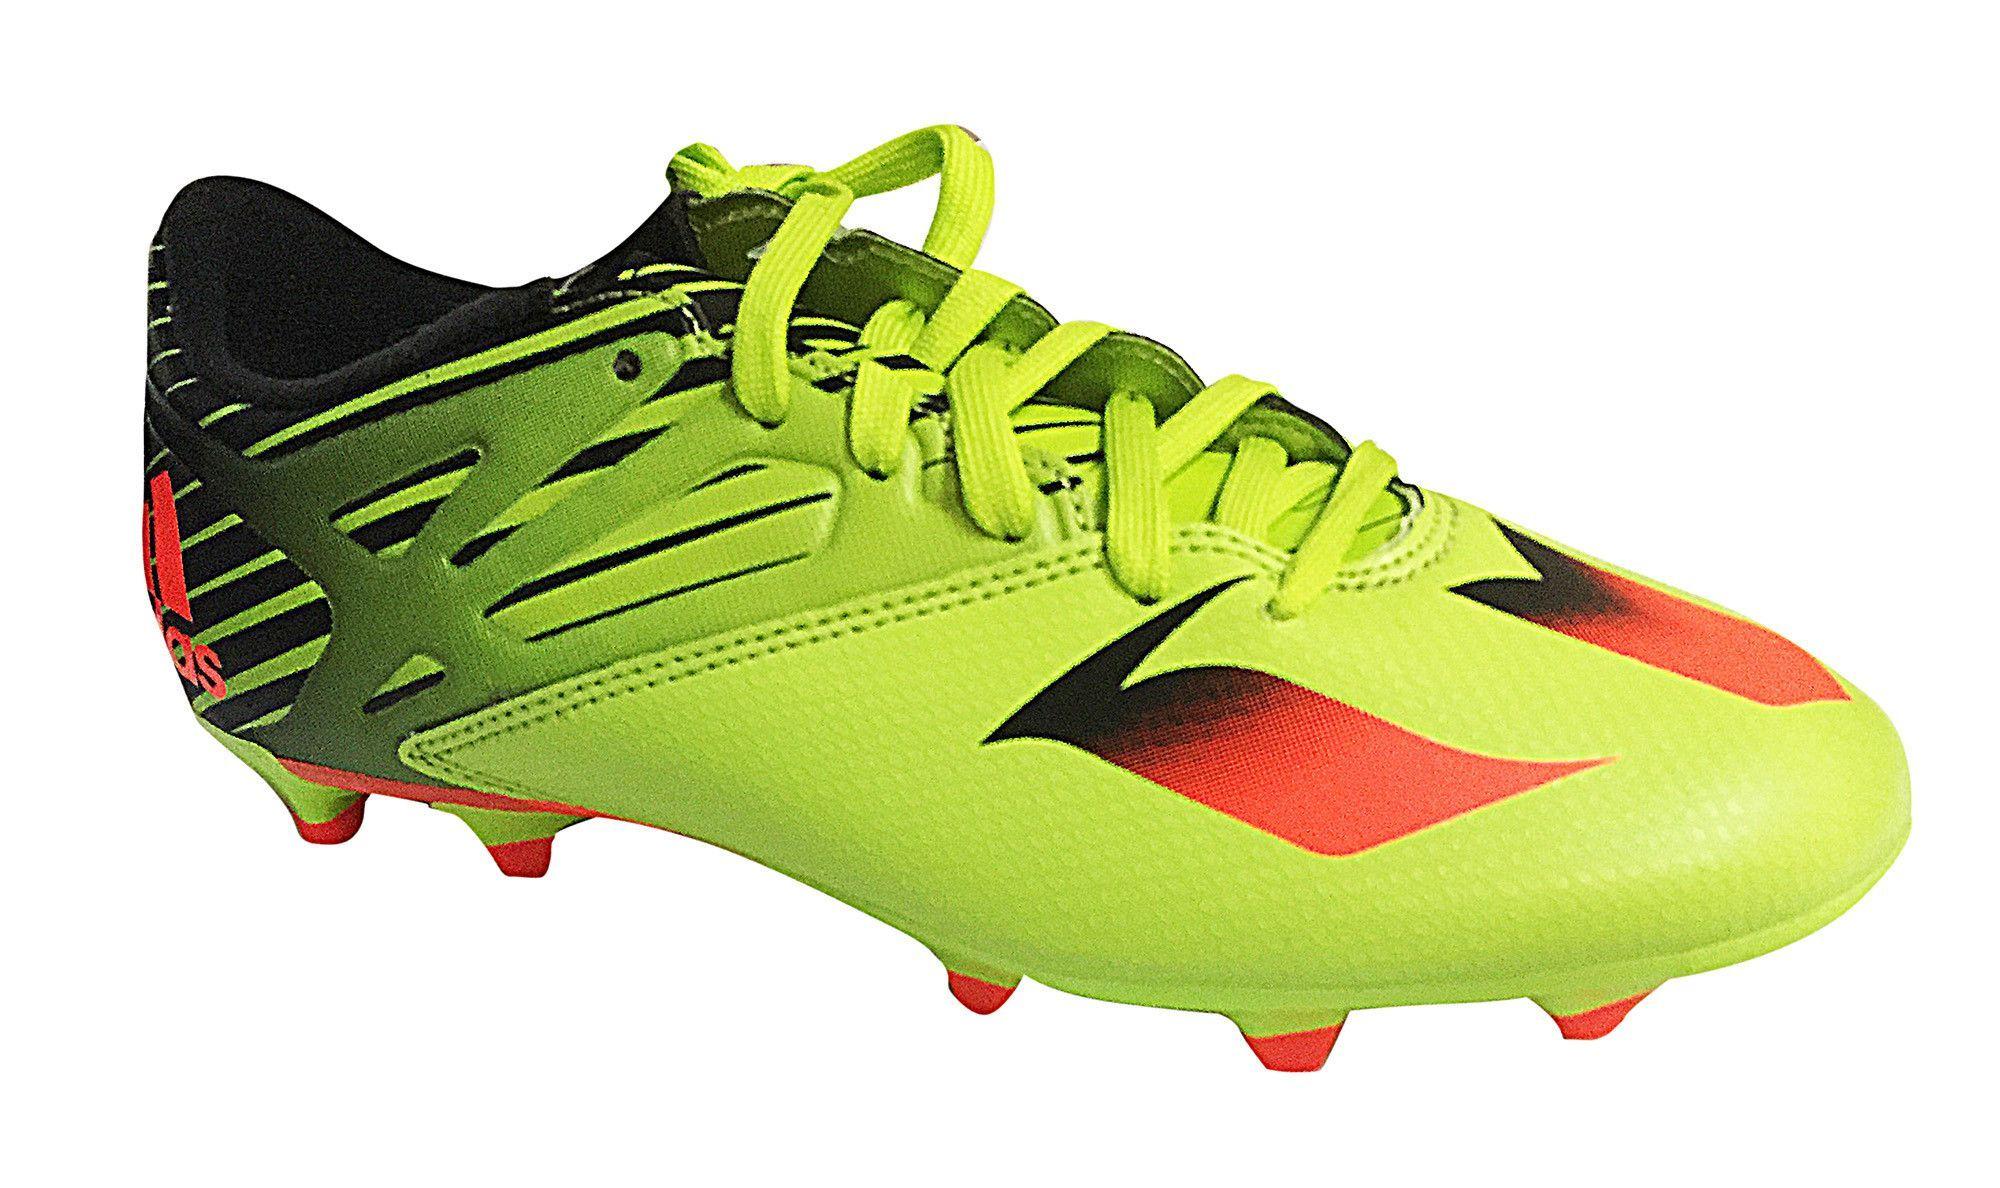 9c5247ae6 adidas Performance Messi 15.3 J Soccer Shoe (Little Kid Big Kid ...